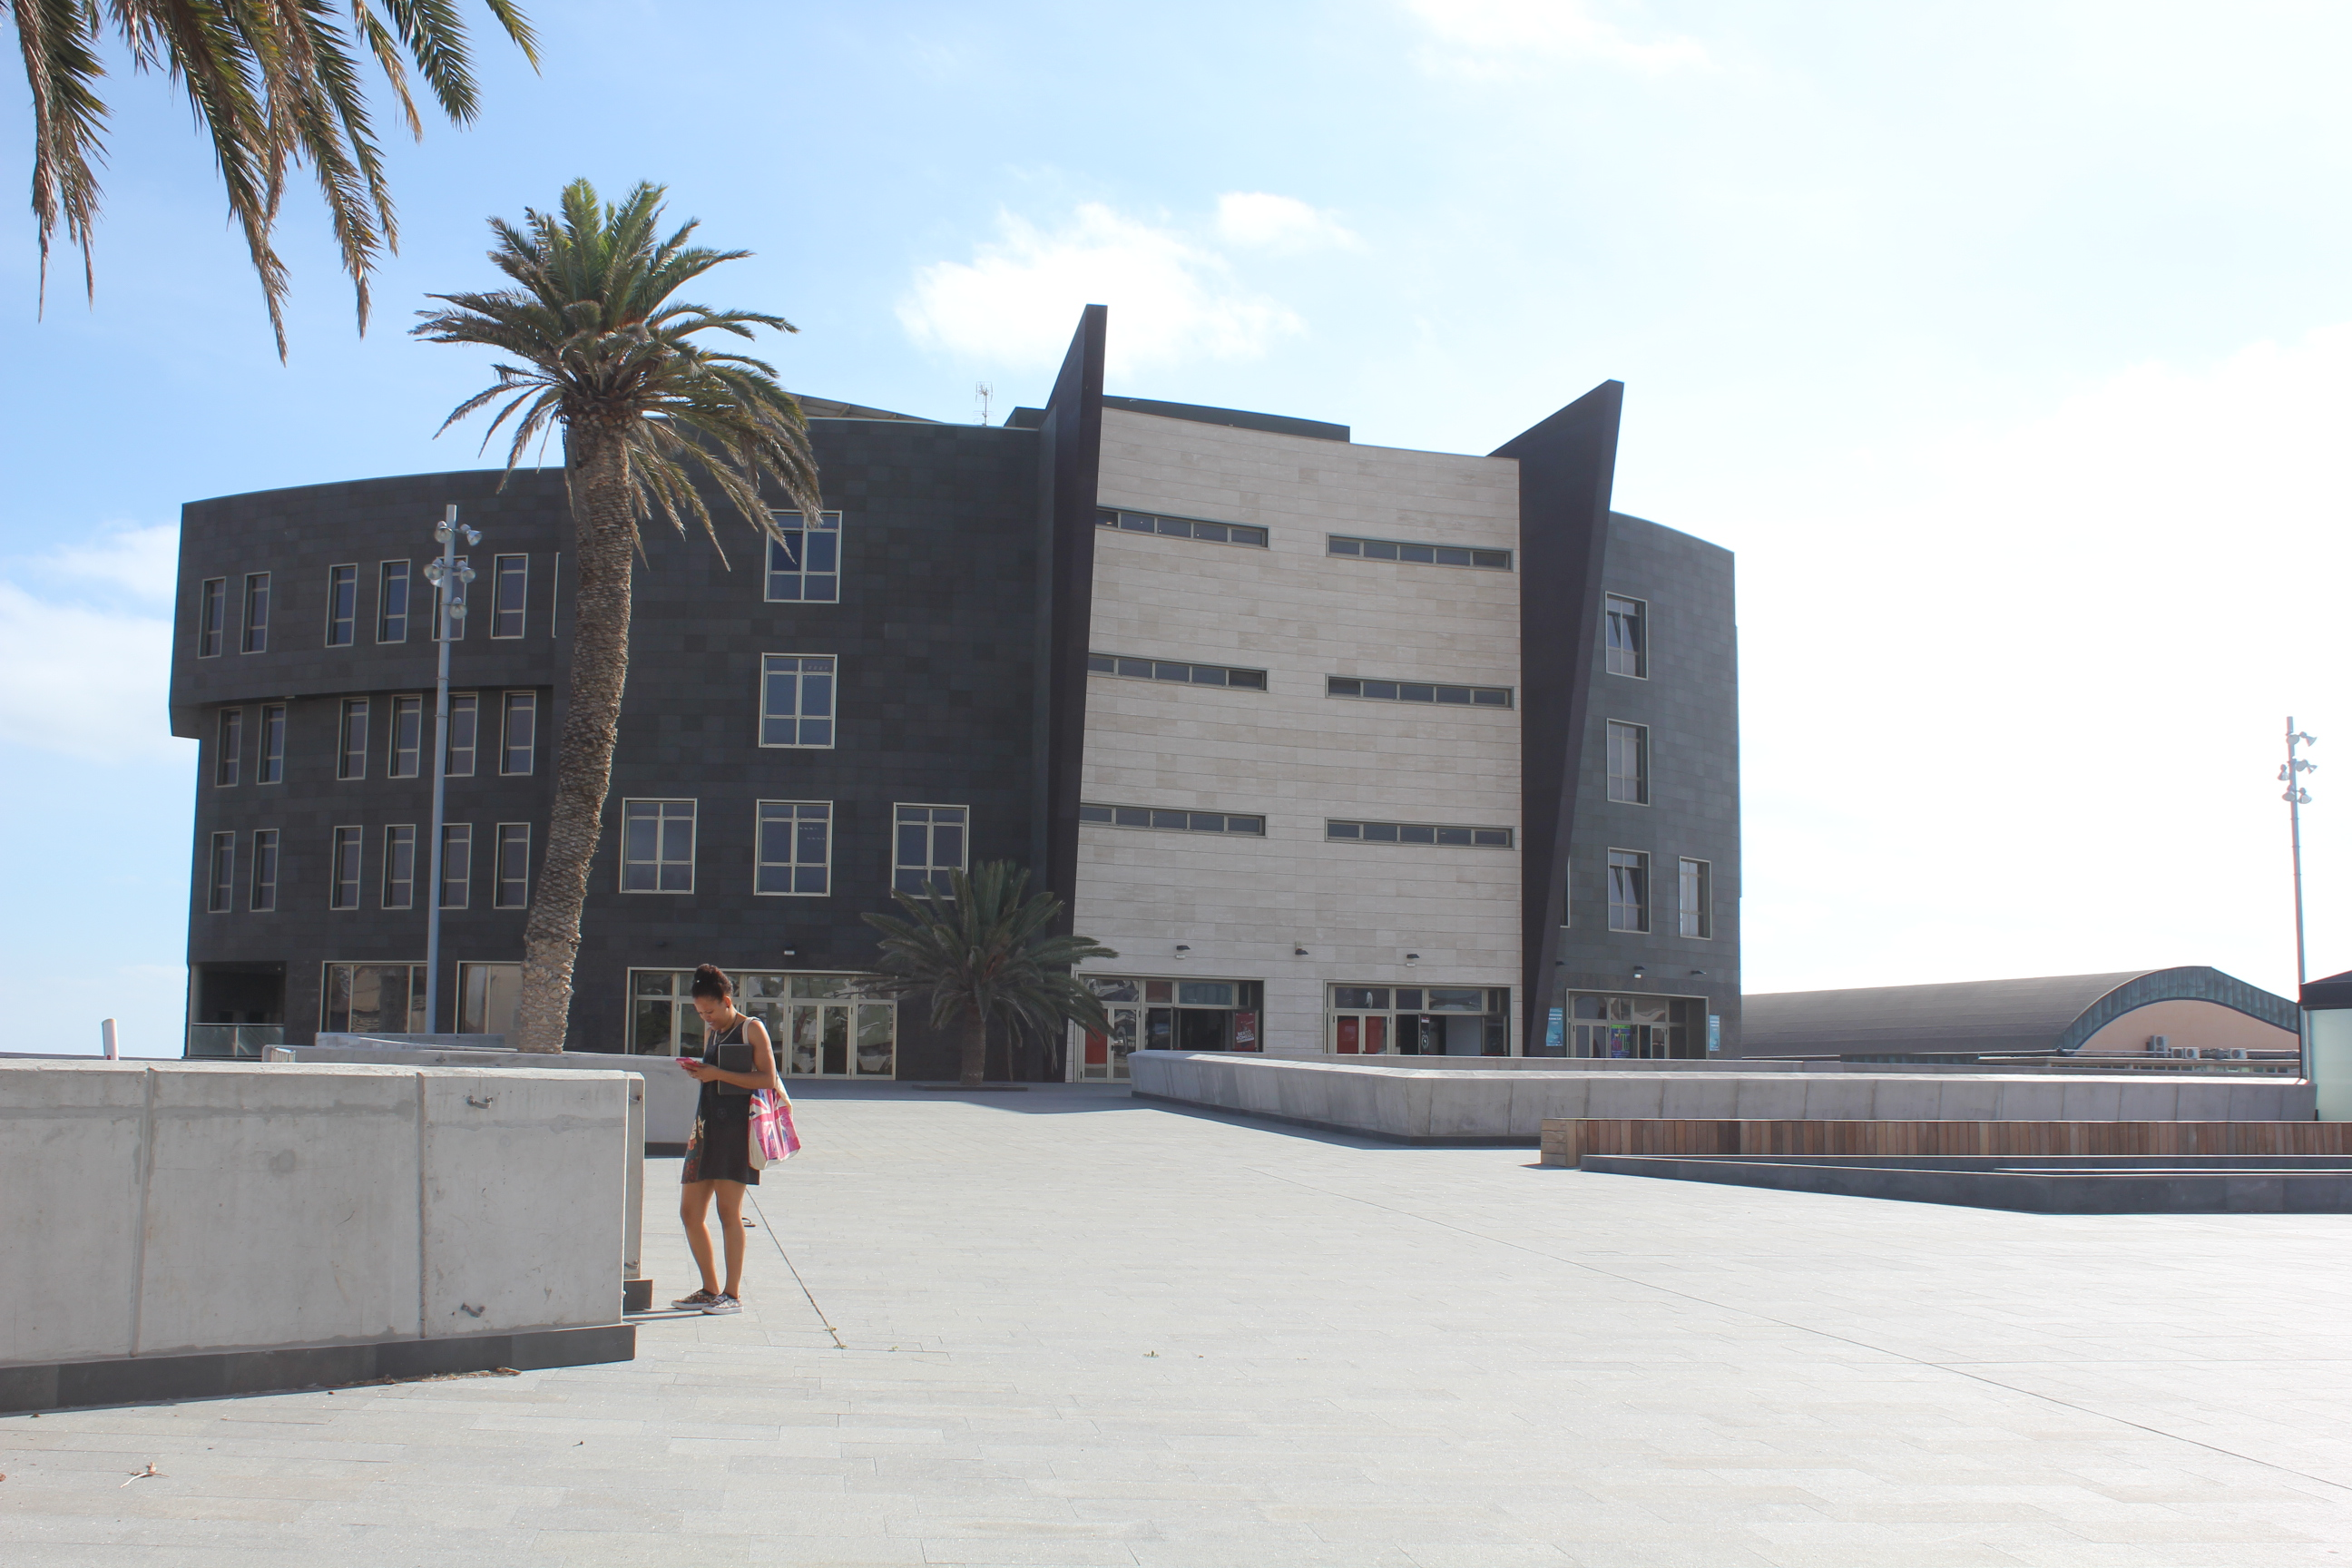 PALACIO-DE-CONGRESOS-1